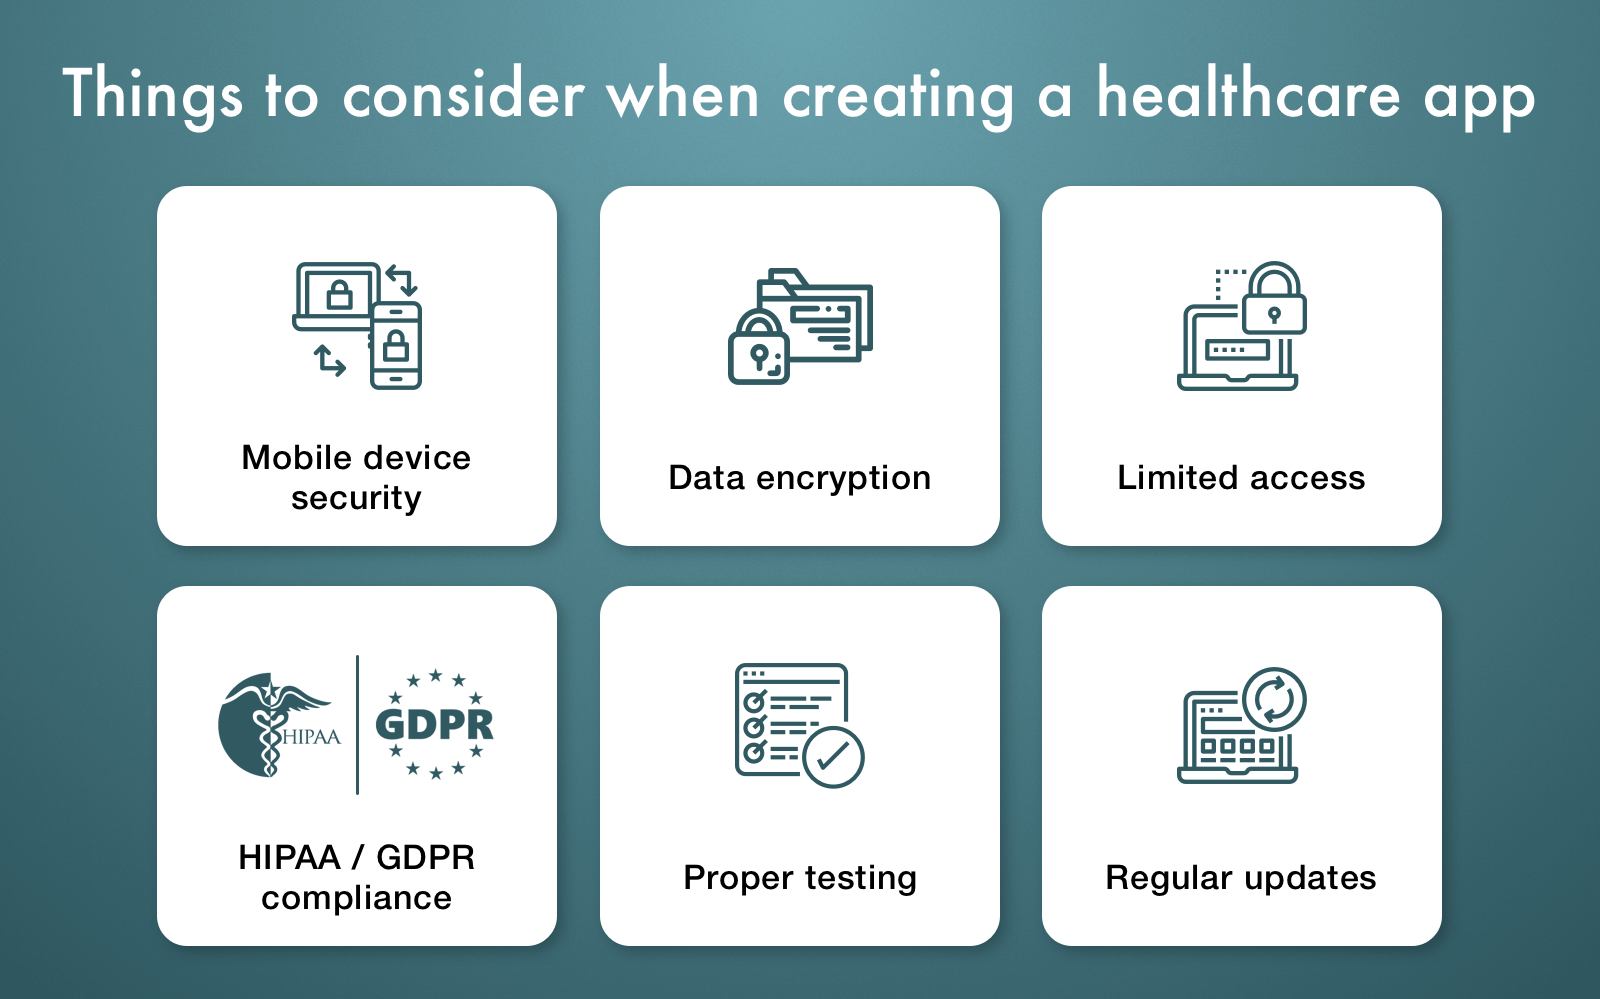 healthcare app security